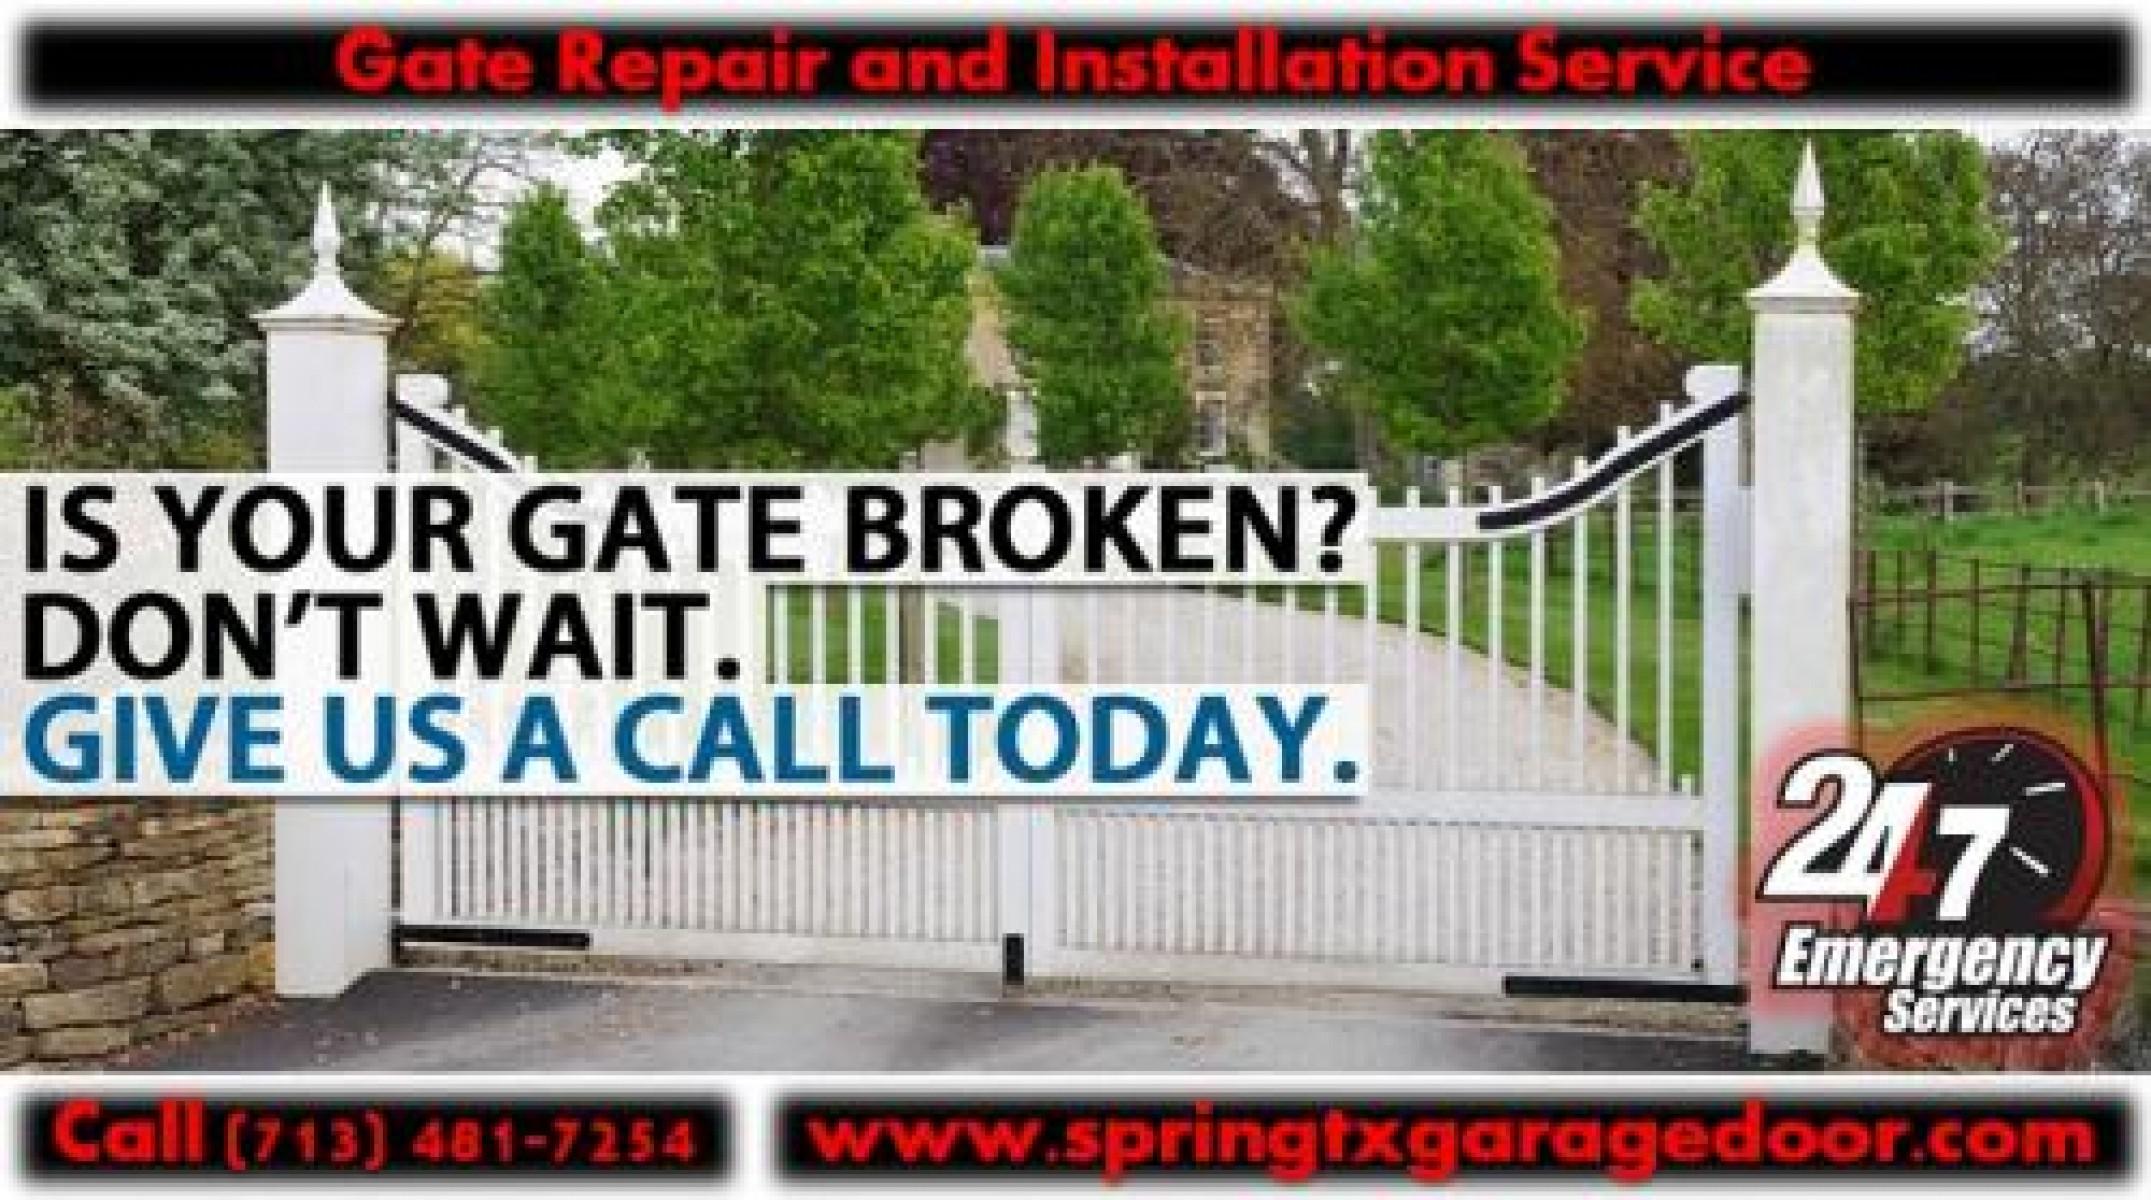 24X7 Garage Door Repair & Commercial Roll Up Gate Repair Spring, Houston